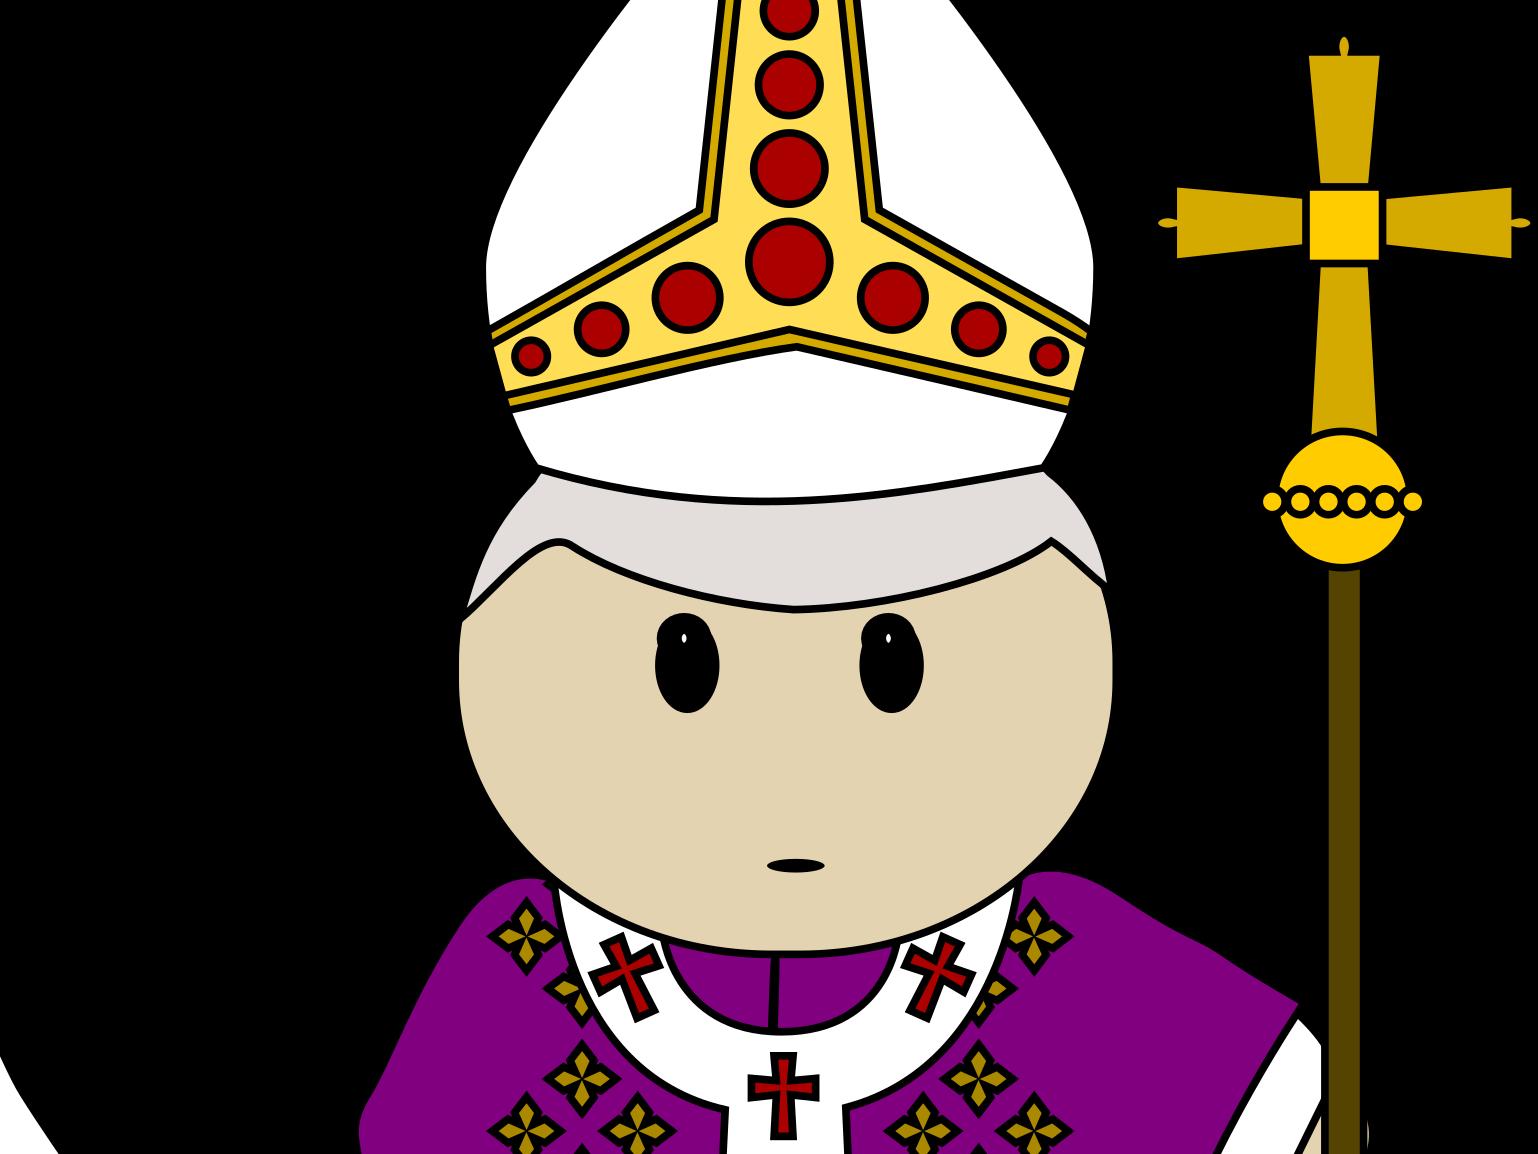 jpg royalty free download Christopher columbus clipart ks1. Preschool europe resources medieval.